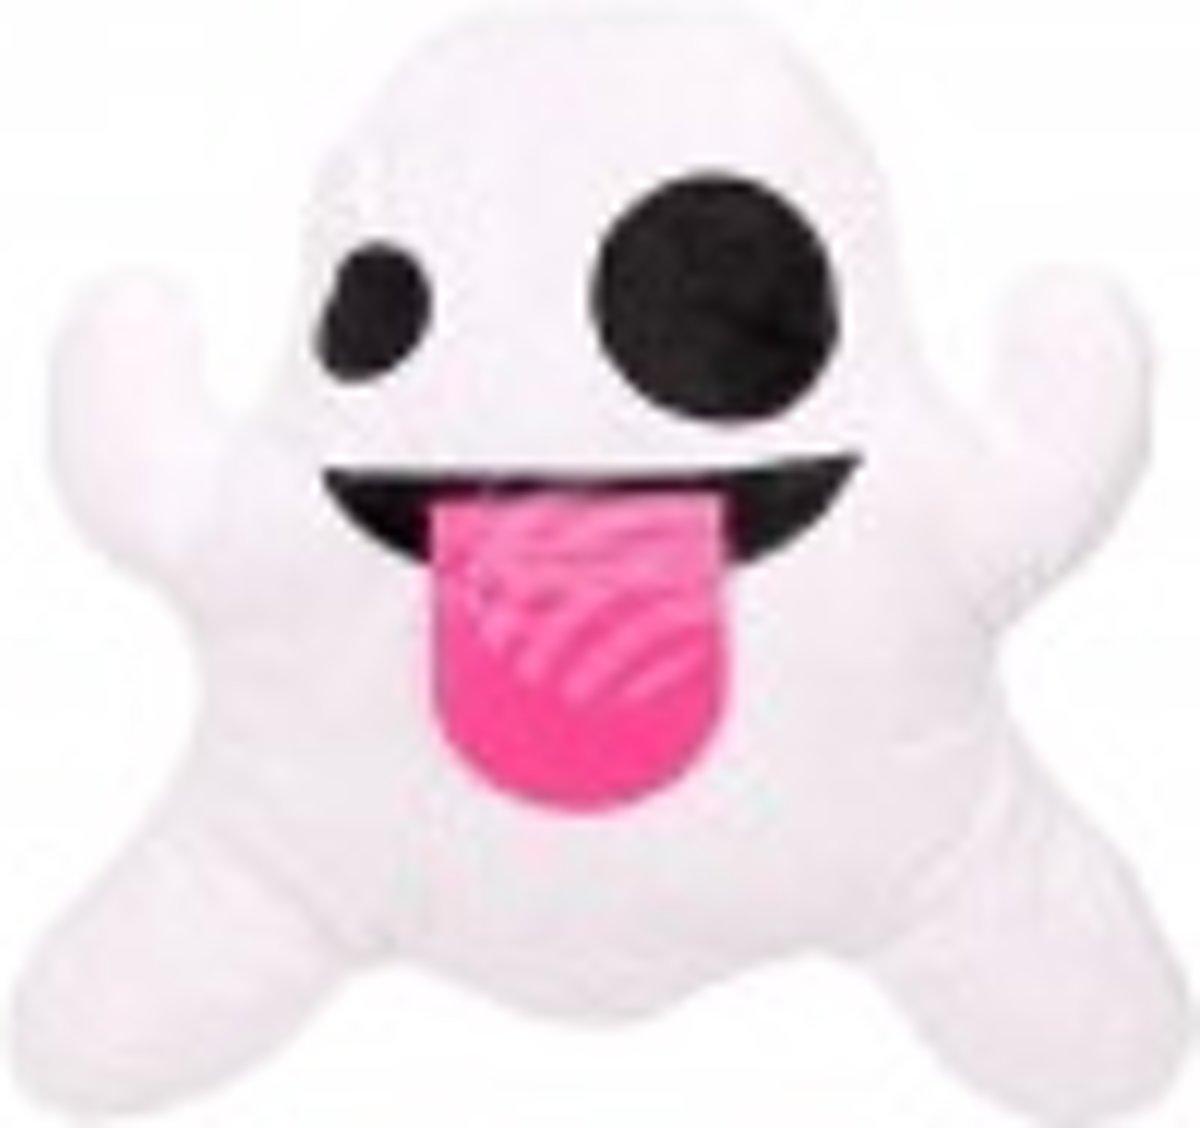 Emoji Kussens Kopen : Aap emoji kussen archidev